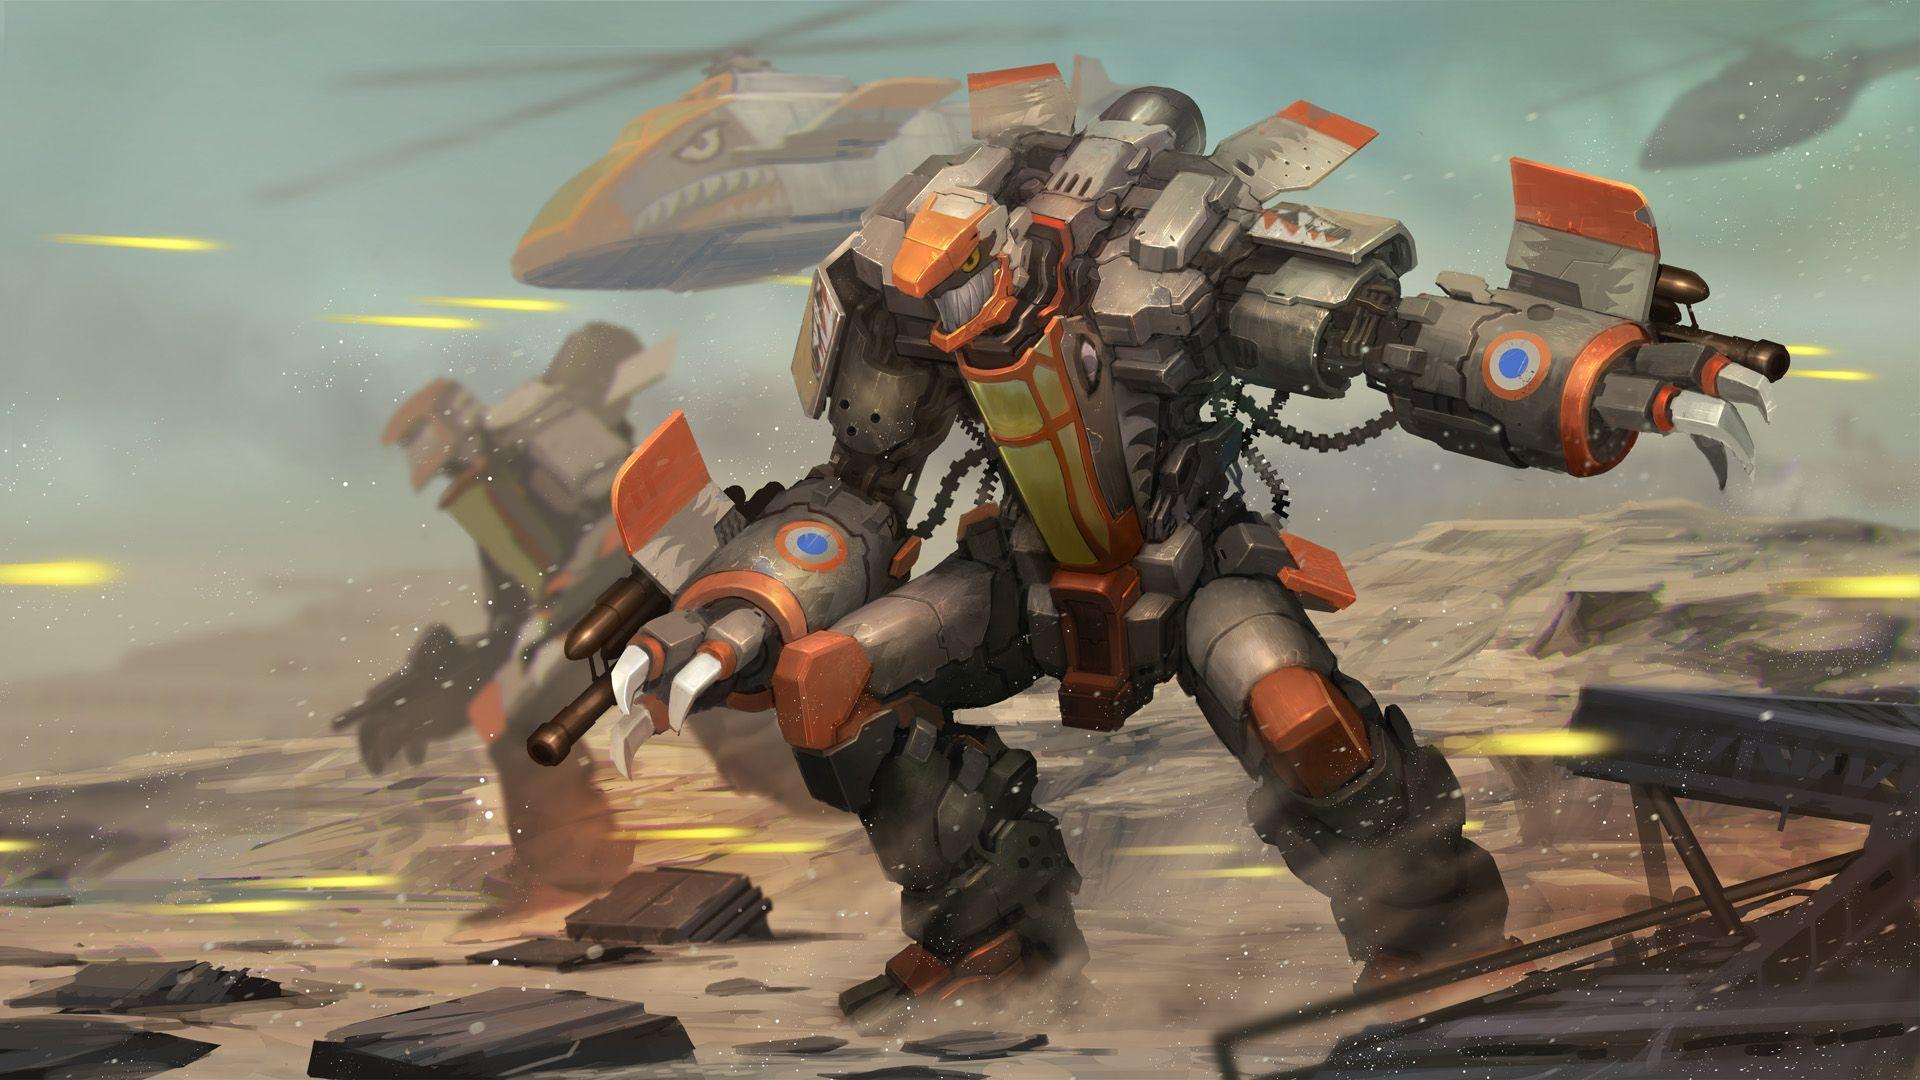 Airmech Strike On Steam Hd Wallpaper Game Download Free Video Game Art